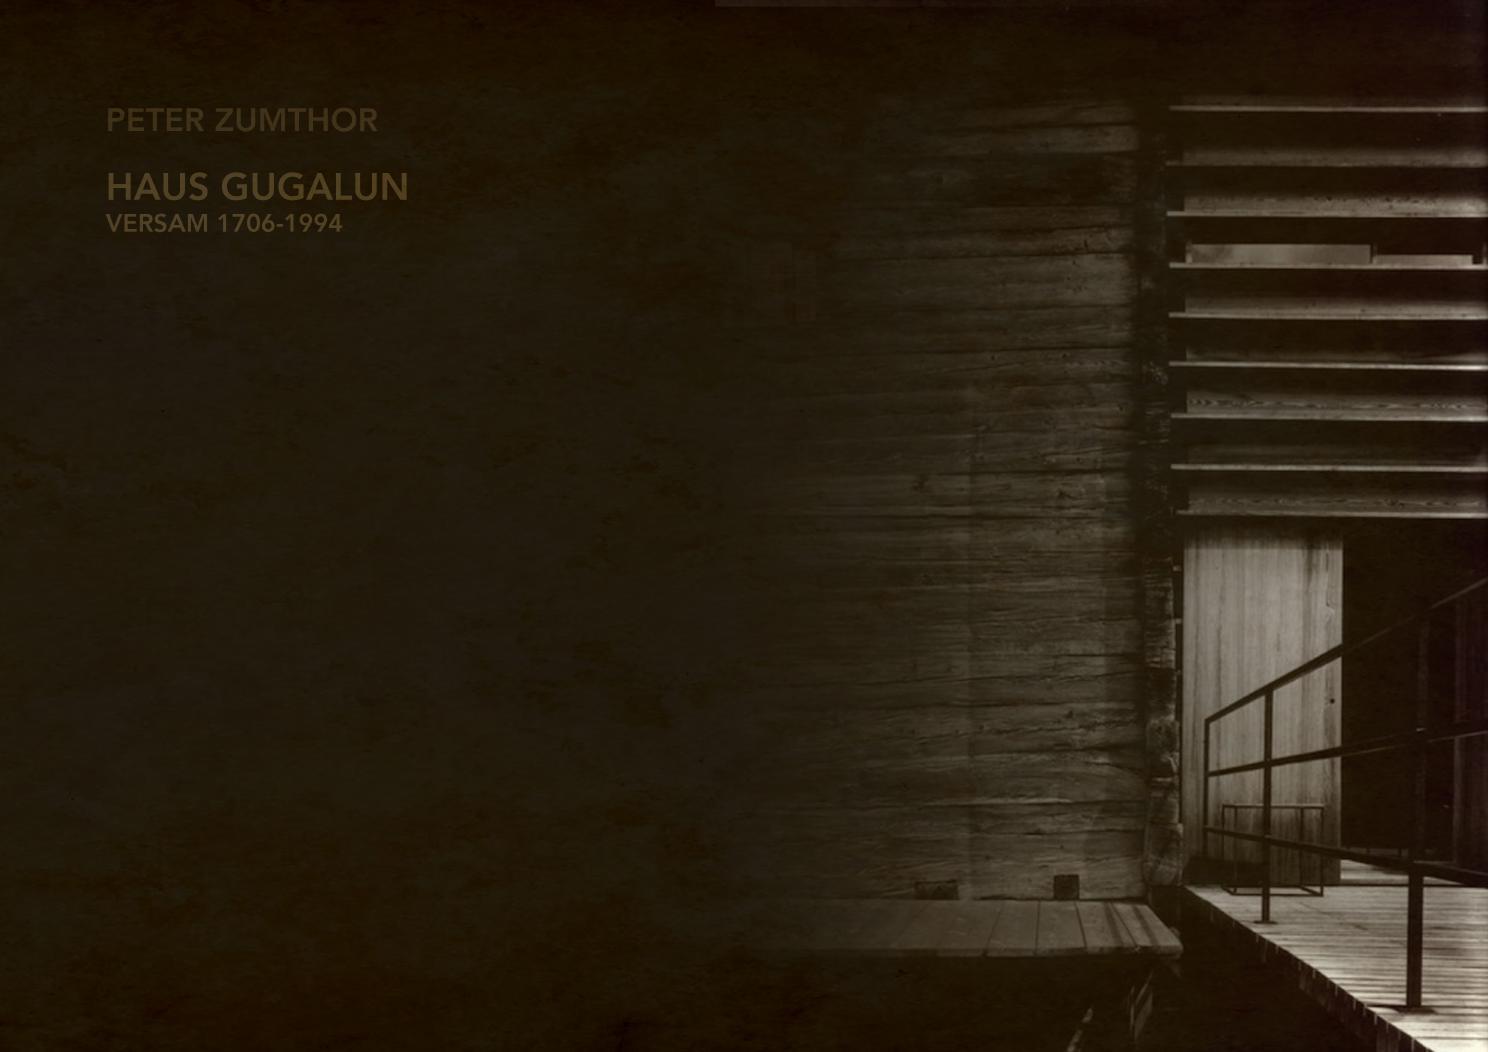 Haus Gugalun Peter Zumthor By Federica Linguanti Issuu